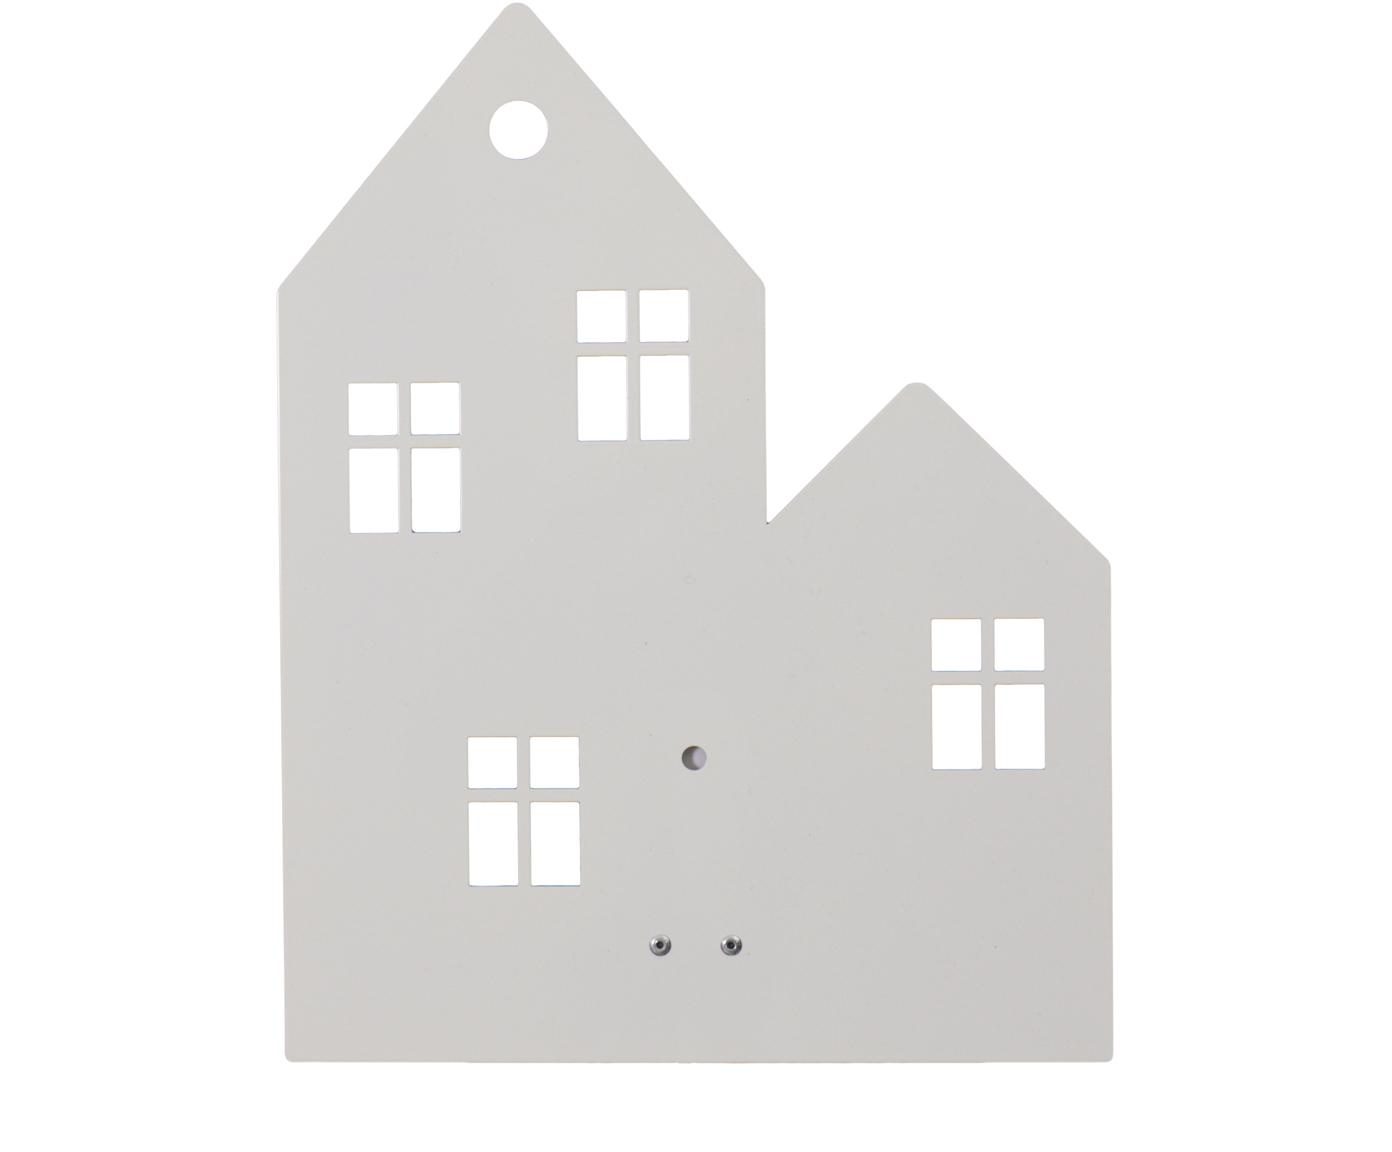 Wandleuchte Town House mit Stecker, Metall, pulverbeschichtet, Weiss, 24 x 35 cm